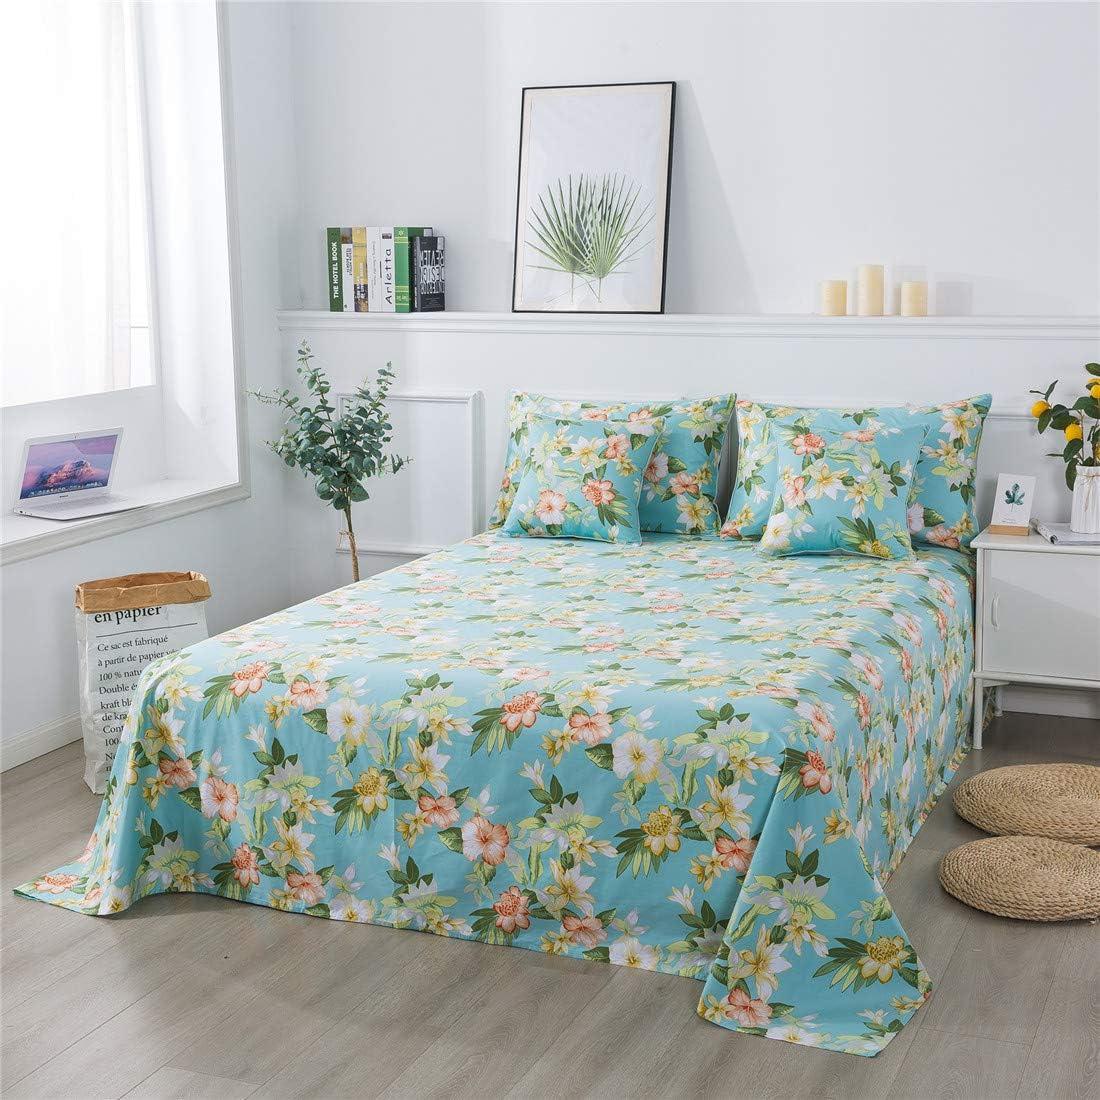 FADFAY Sheets Set Queen Elegant Watercolor Floral Bedding 800 Thread Count Luxury Vintage Farmhouse Bedding Hypoallergenic 100% Egyptian Cotton